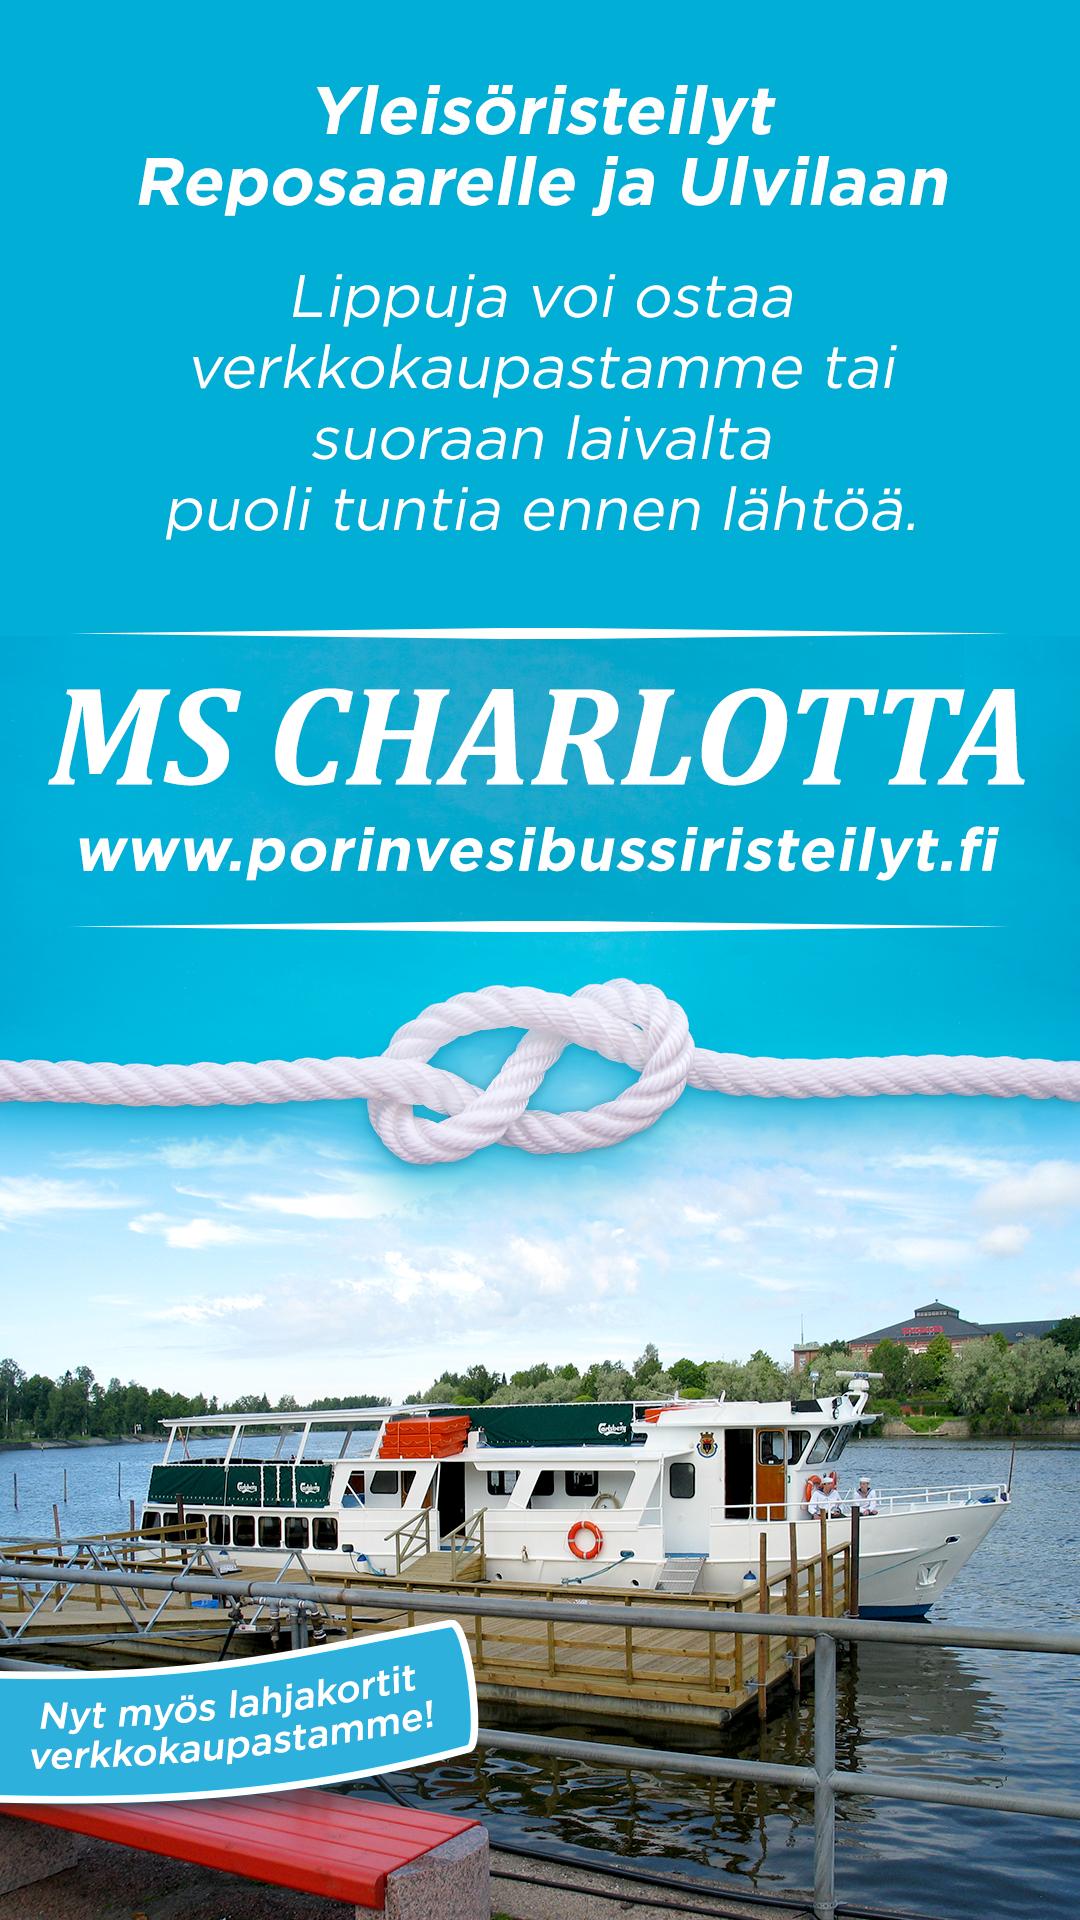 Yleisöristeily Porista Ulvilaan ke 12.8